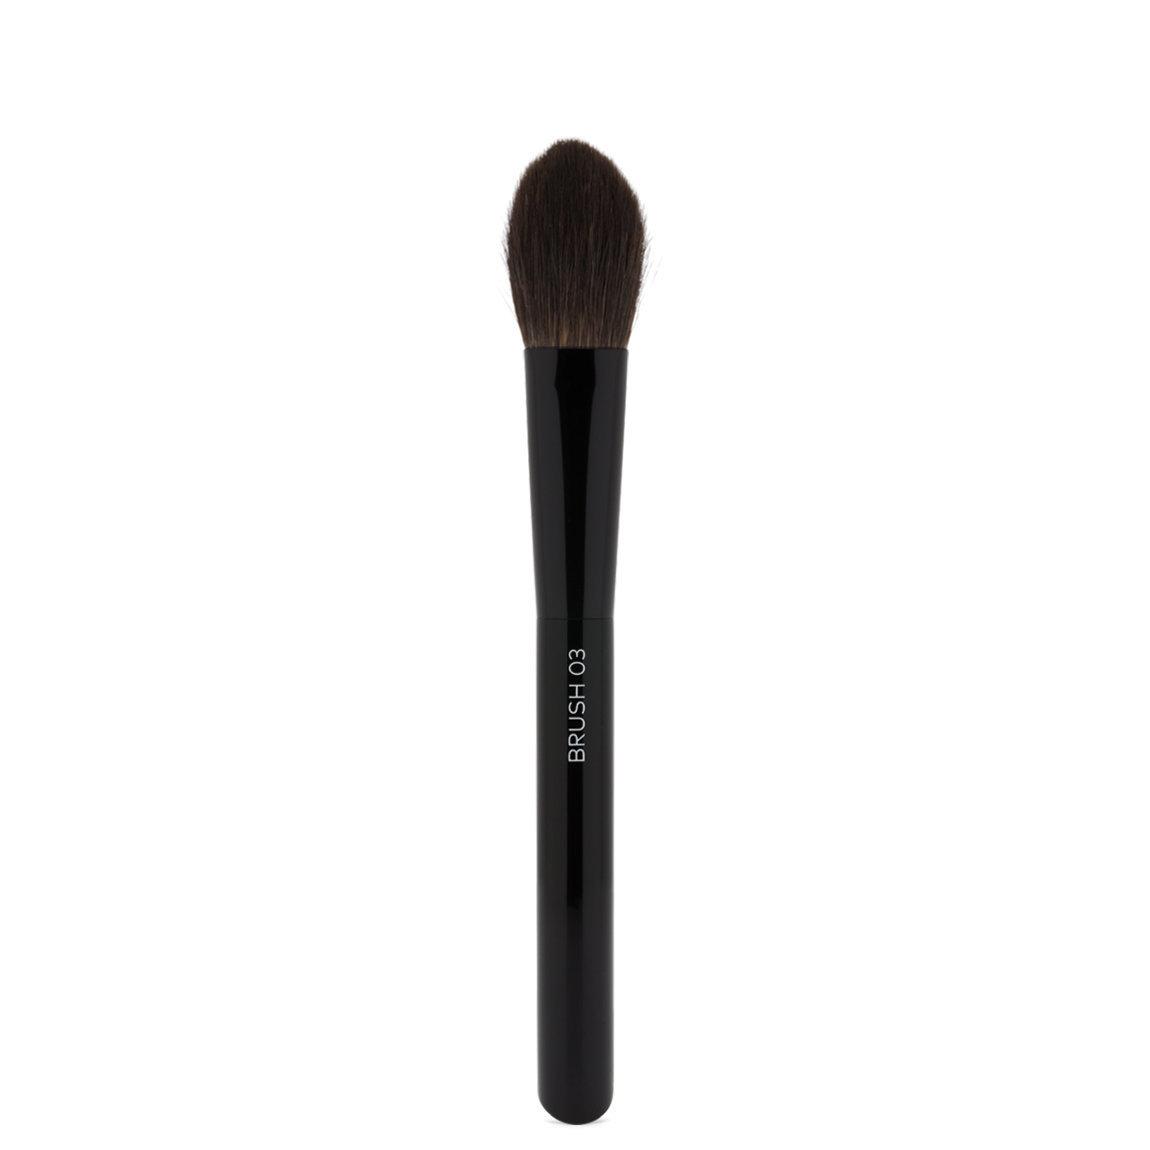 Beautylish Presents Yano Series Brush 03 Highlight alternative view 1 - product swatch.